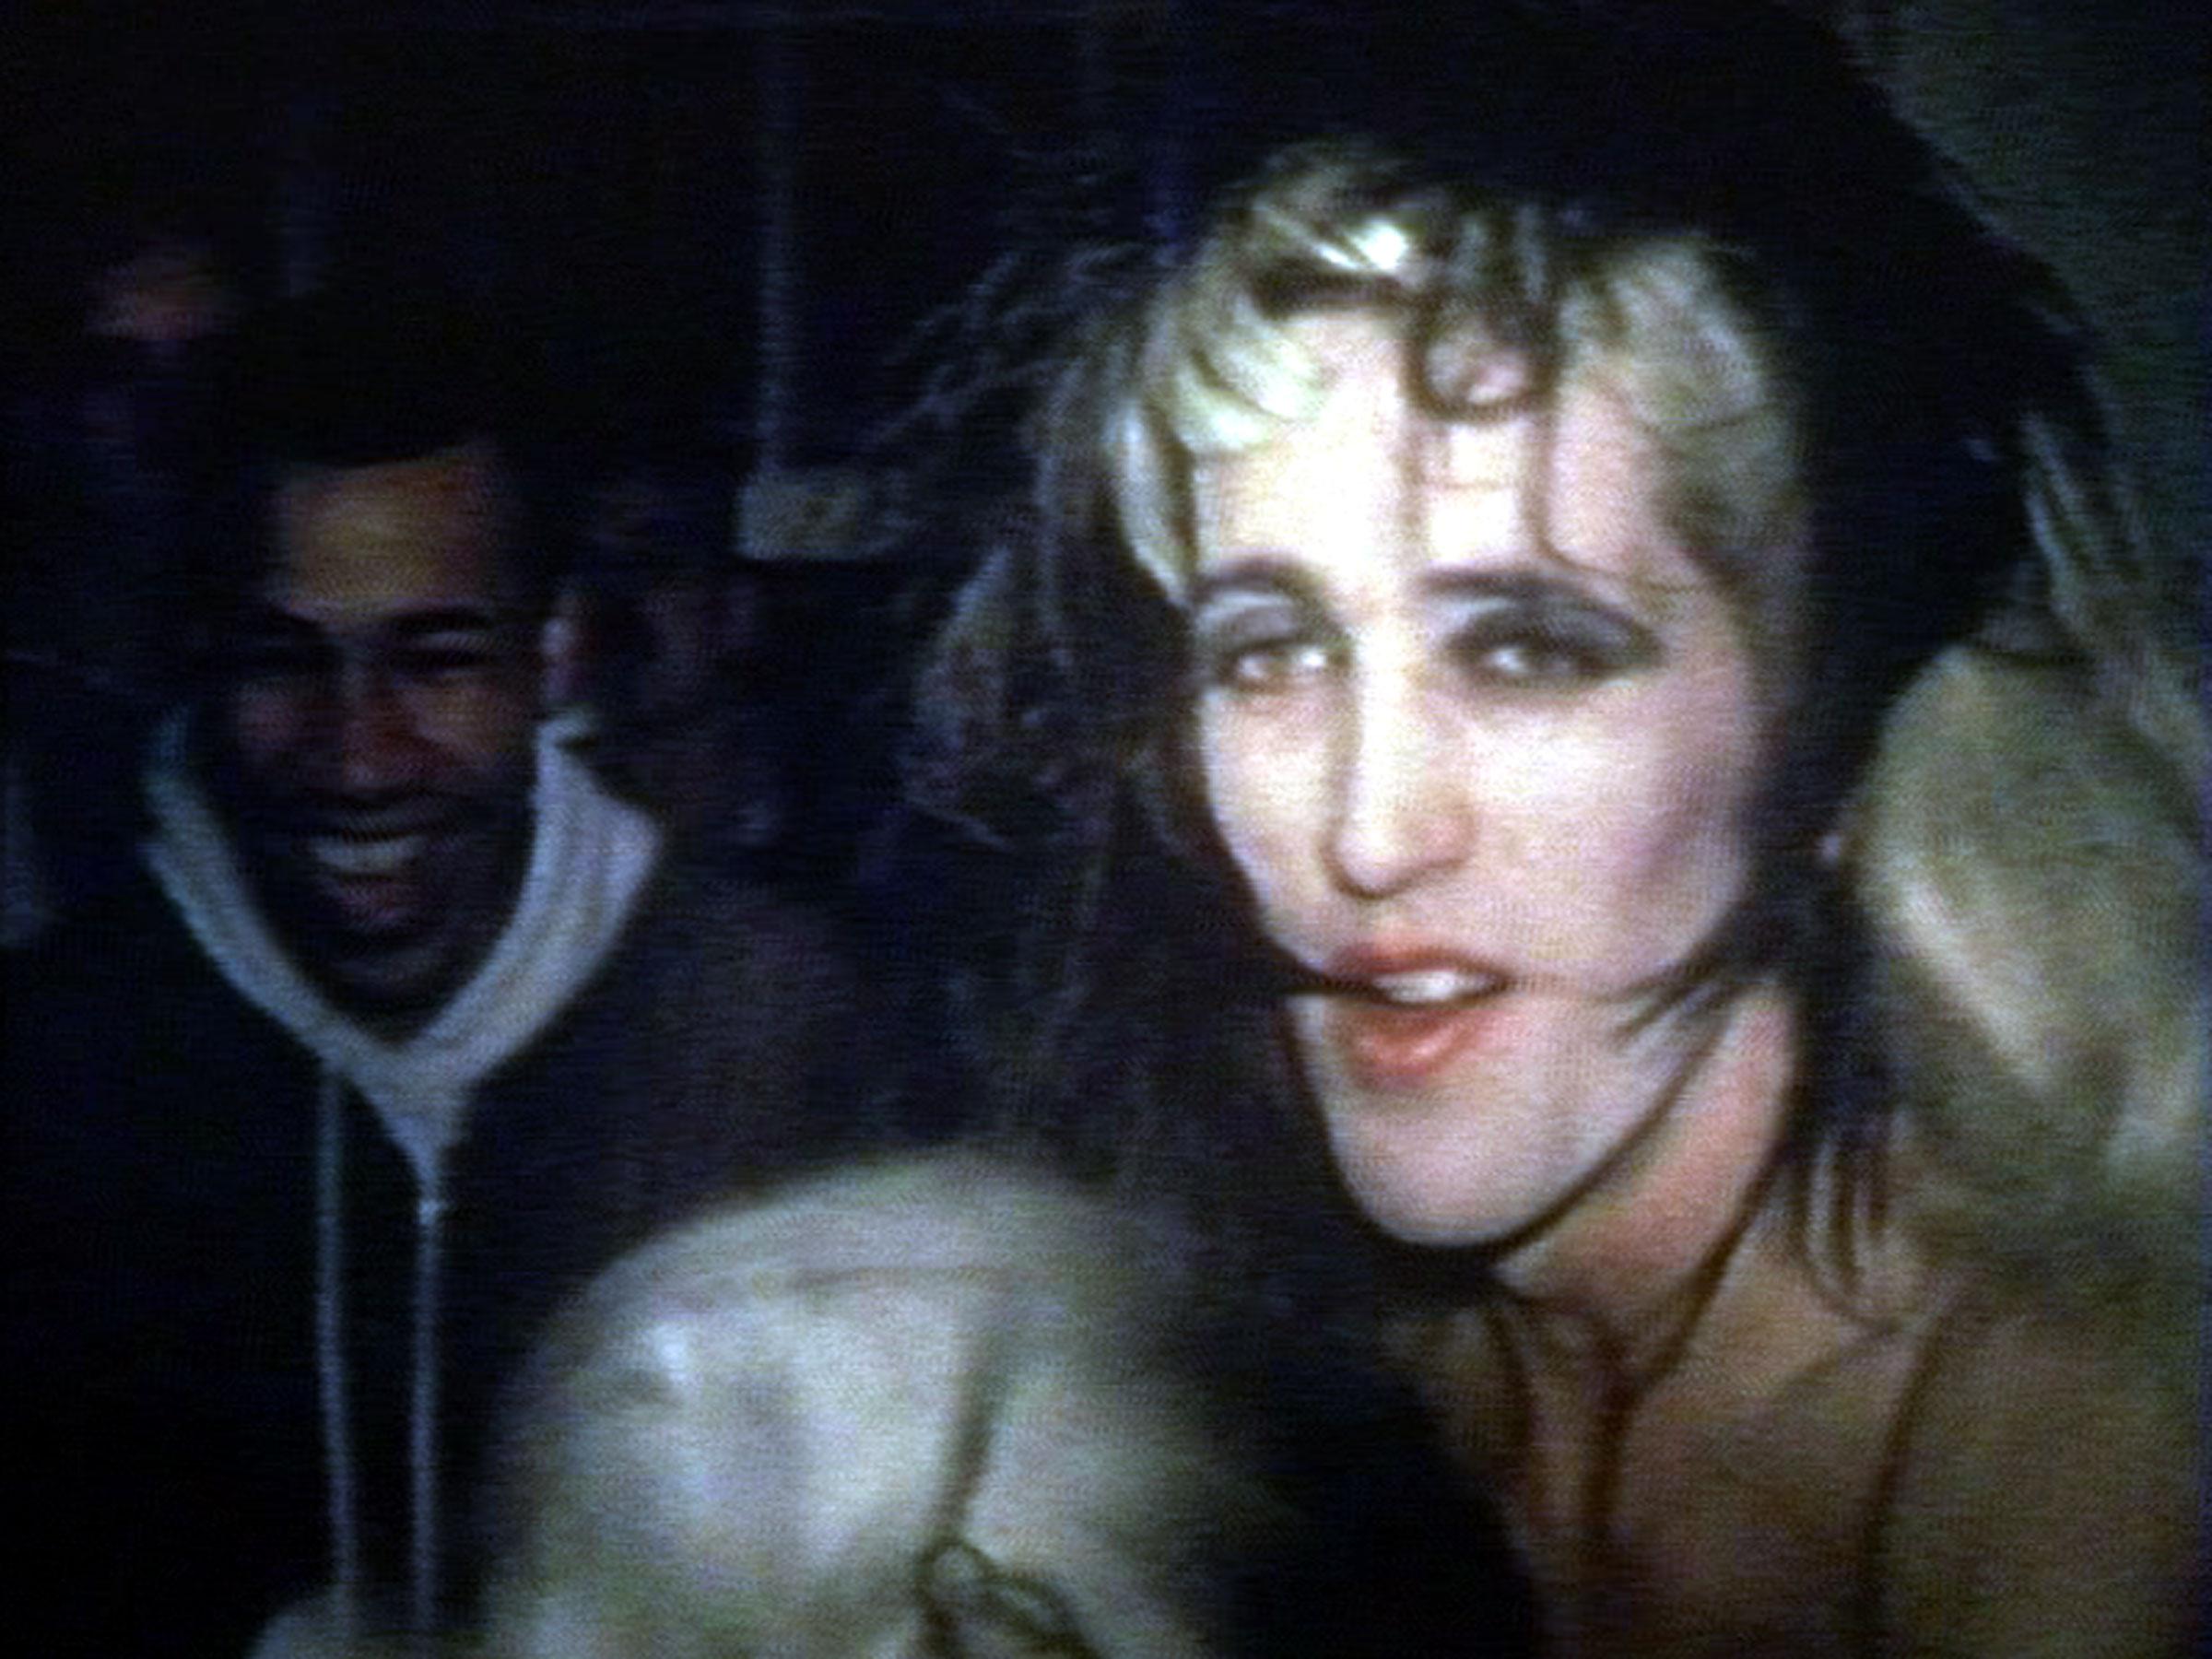 1989-12-09-SF-Vinyldrome-tv02-Shaun